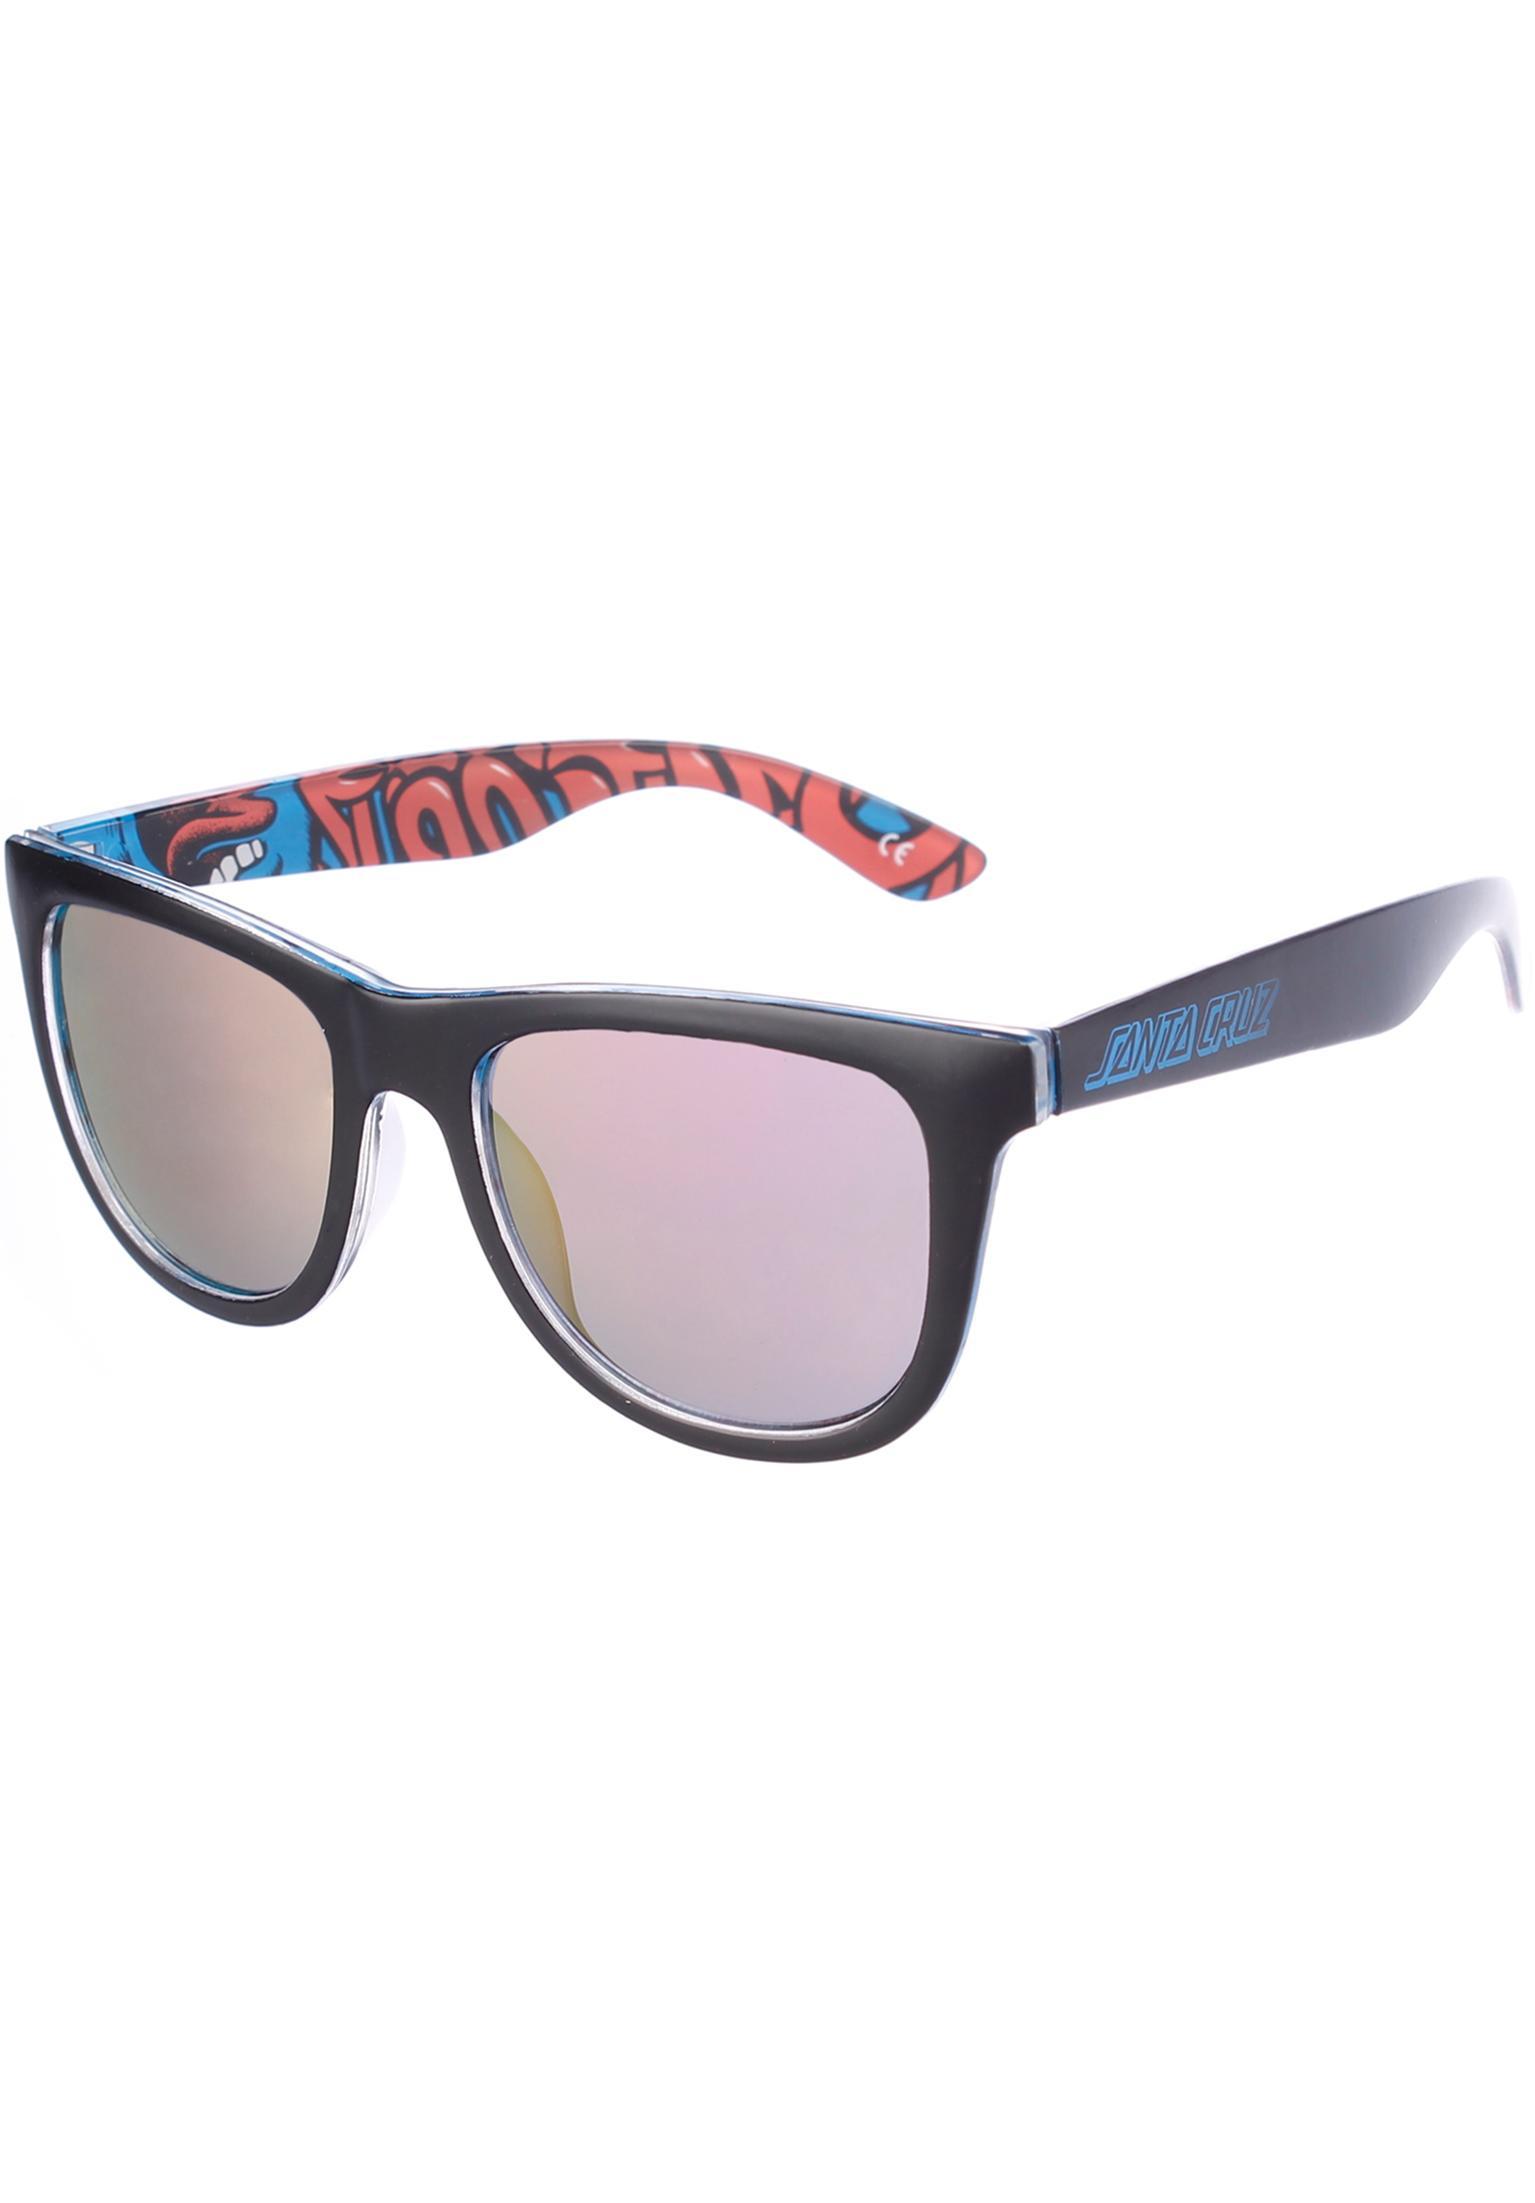 e3864810a9d2 Screaming Insider Santa-Cruz Sunglasses in black-blue for Men   Titus